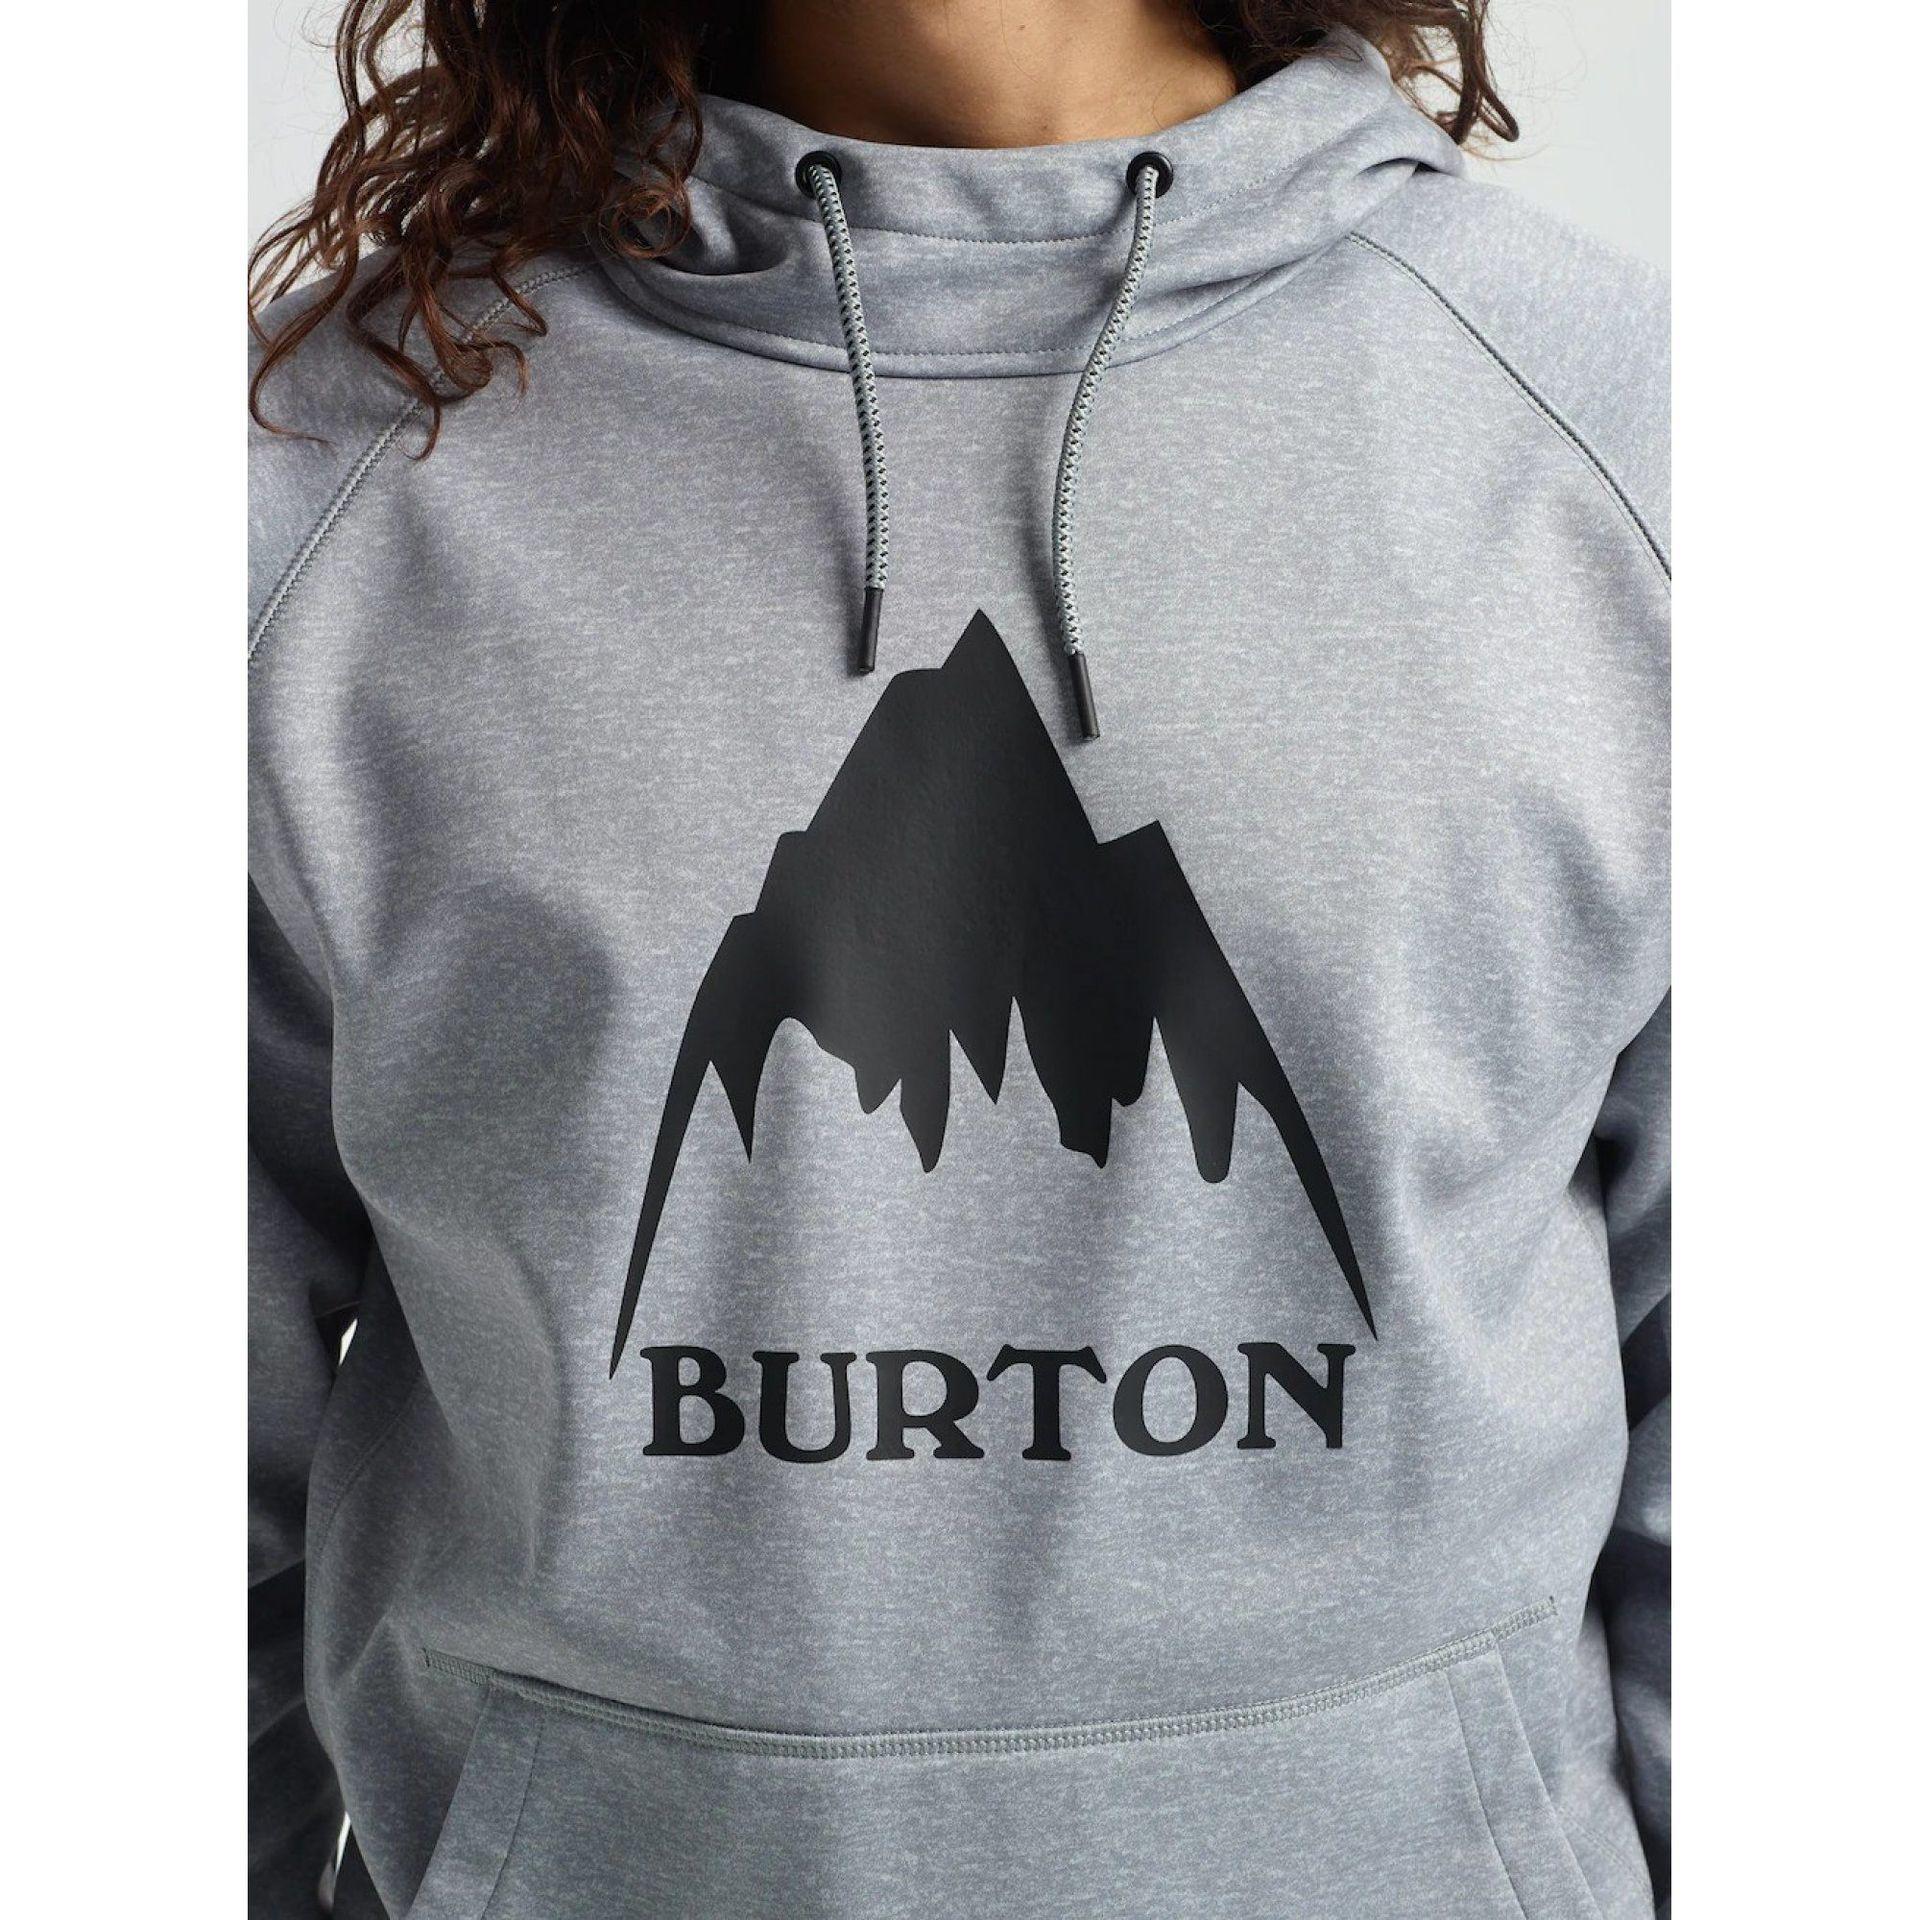 BLUZA BURTON CROWN BONDED PULLOVER GRAY HEATHER 108911 020 3